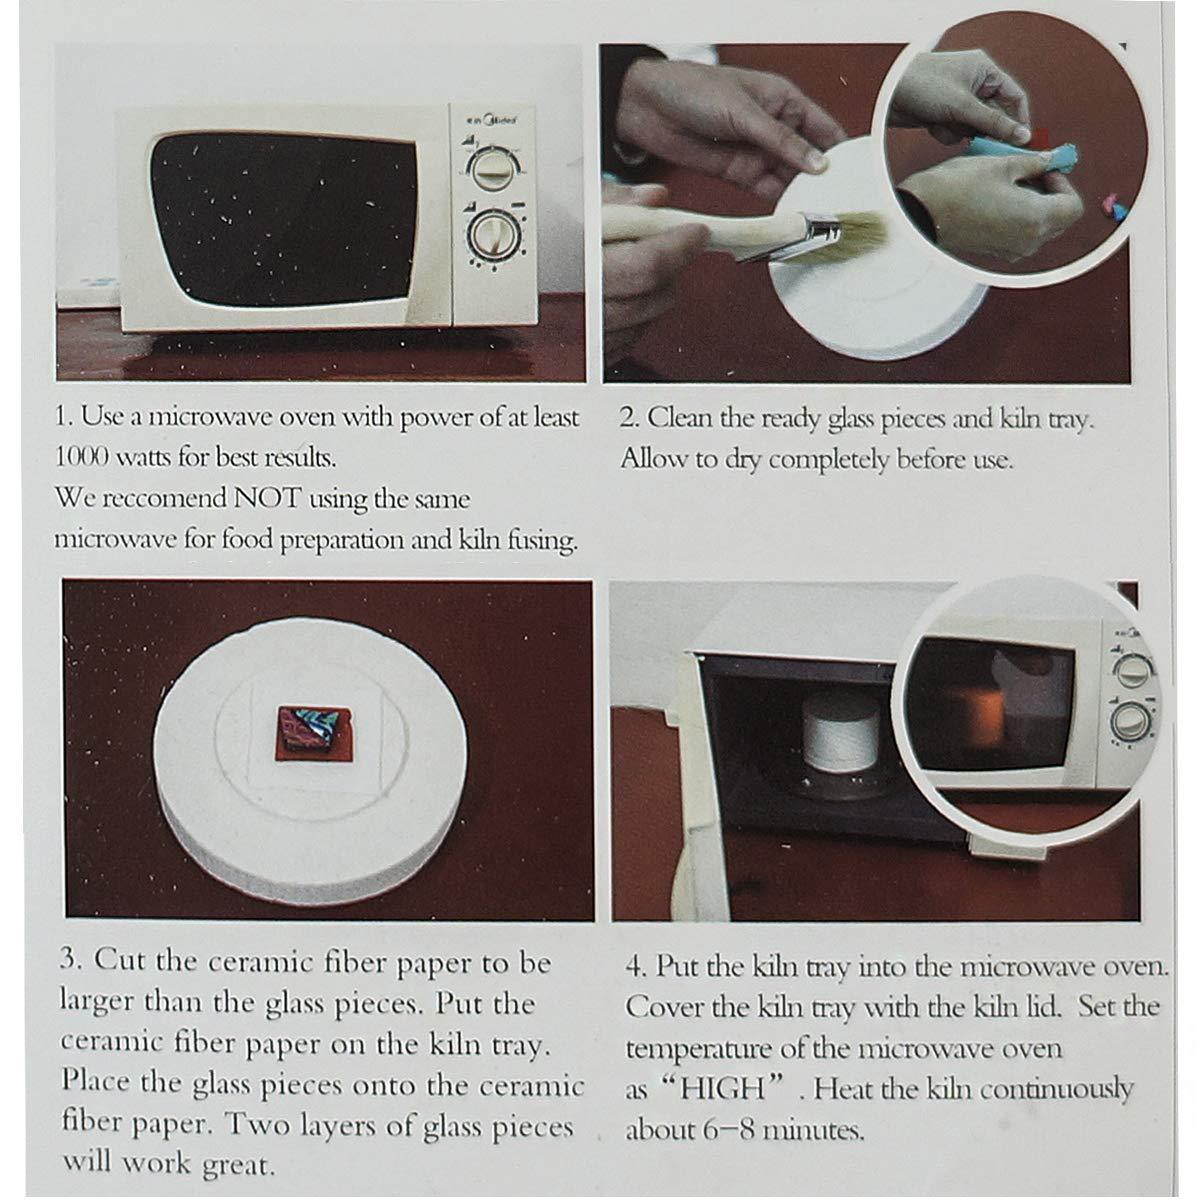 Microwave Kiln and DIY Fusing Glass Jewelry Set,Extra Large Microwave Kiln Kit For Fusing Glass Kiln 10 PCS Set,ROY ROJAS Professional Microwave Kiln Kit Set - for DIY Jewelry Glass Fusing Kiln tools by ROY ROJAS (Image #4)